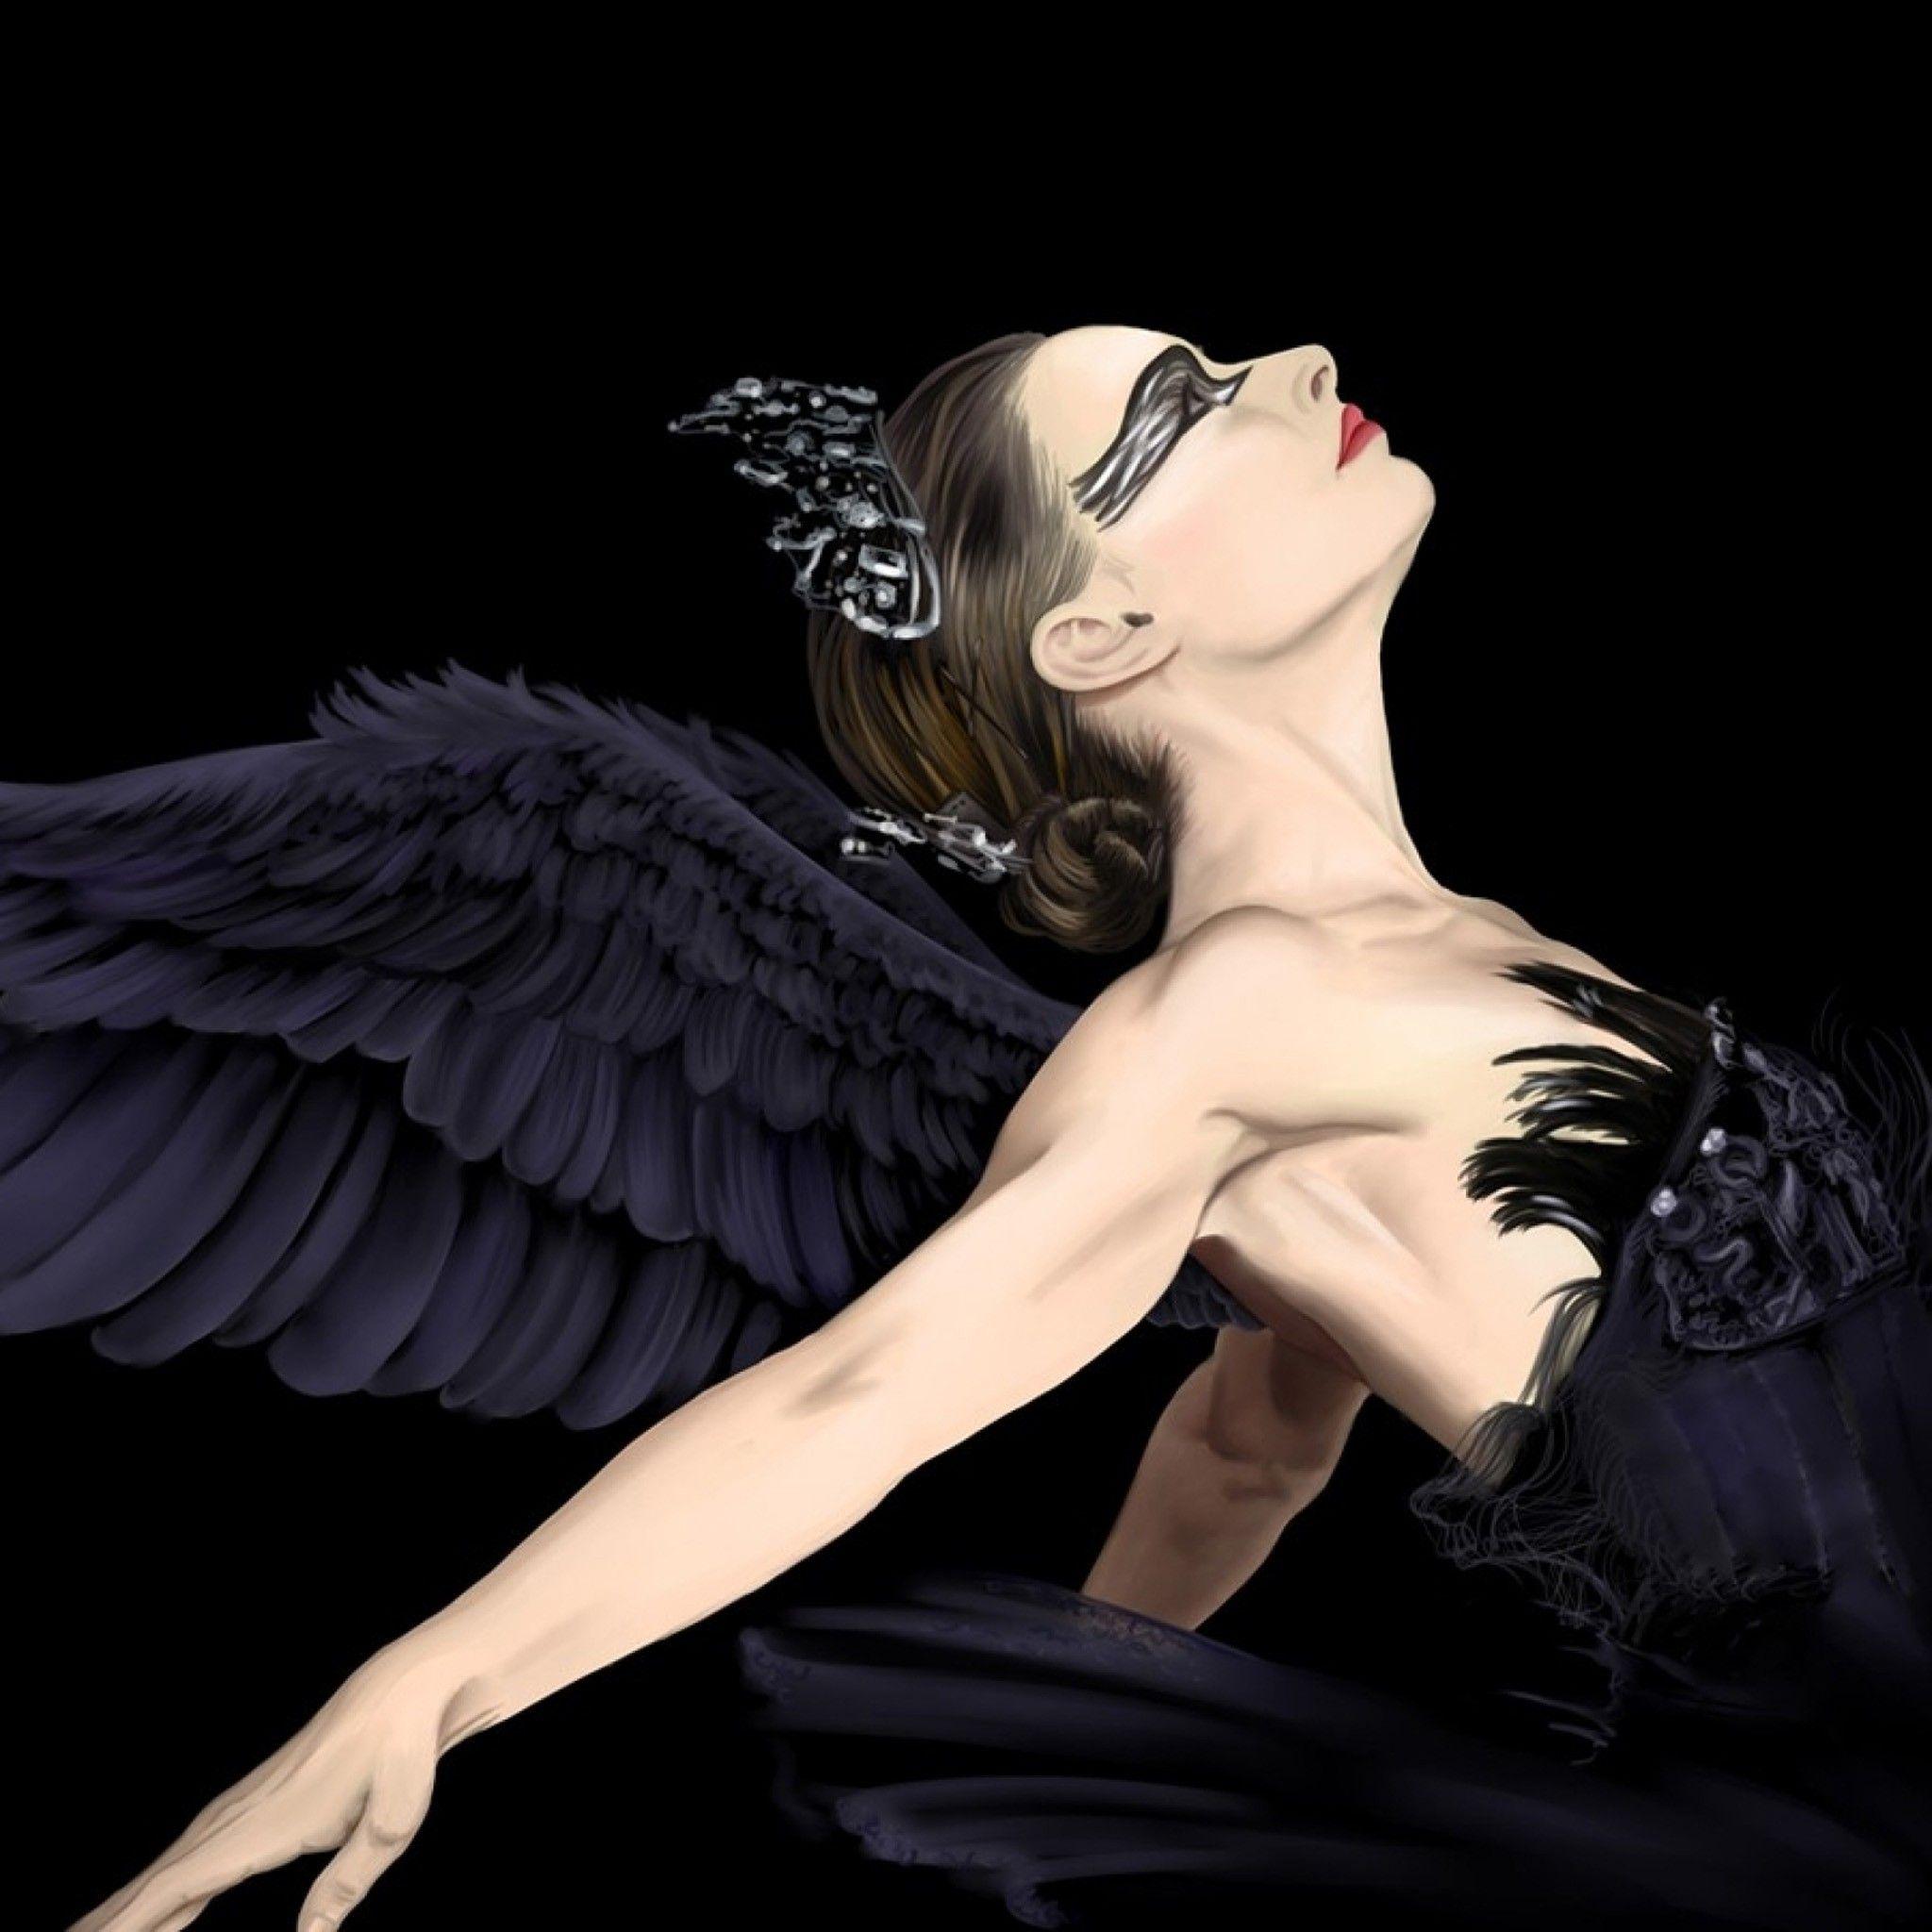 балерина ангел картинки человек разбит, голове